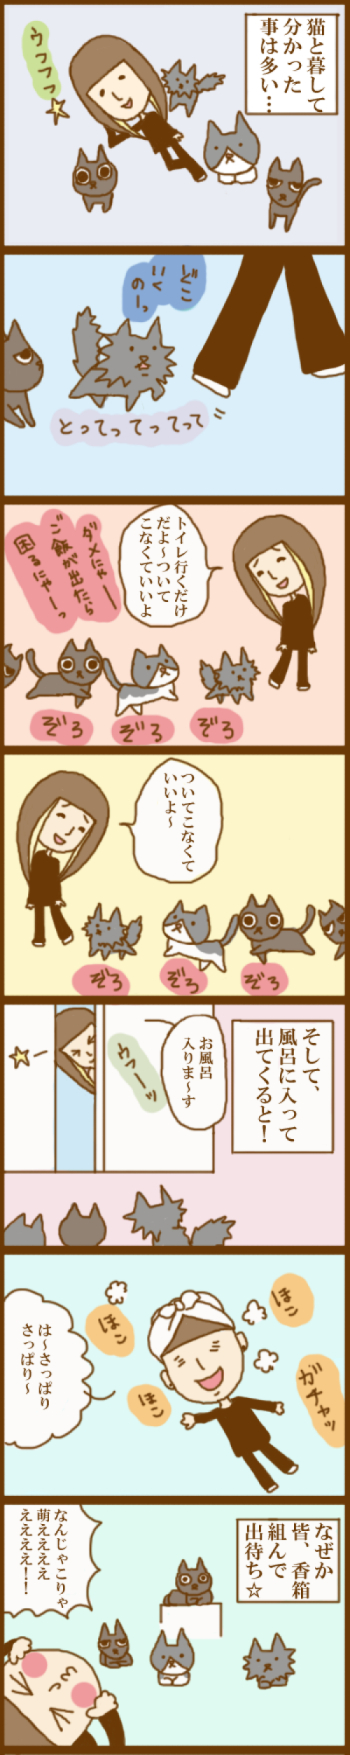 f:id:suzuokayu:20201117094750j:plain